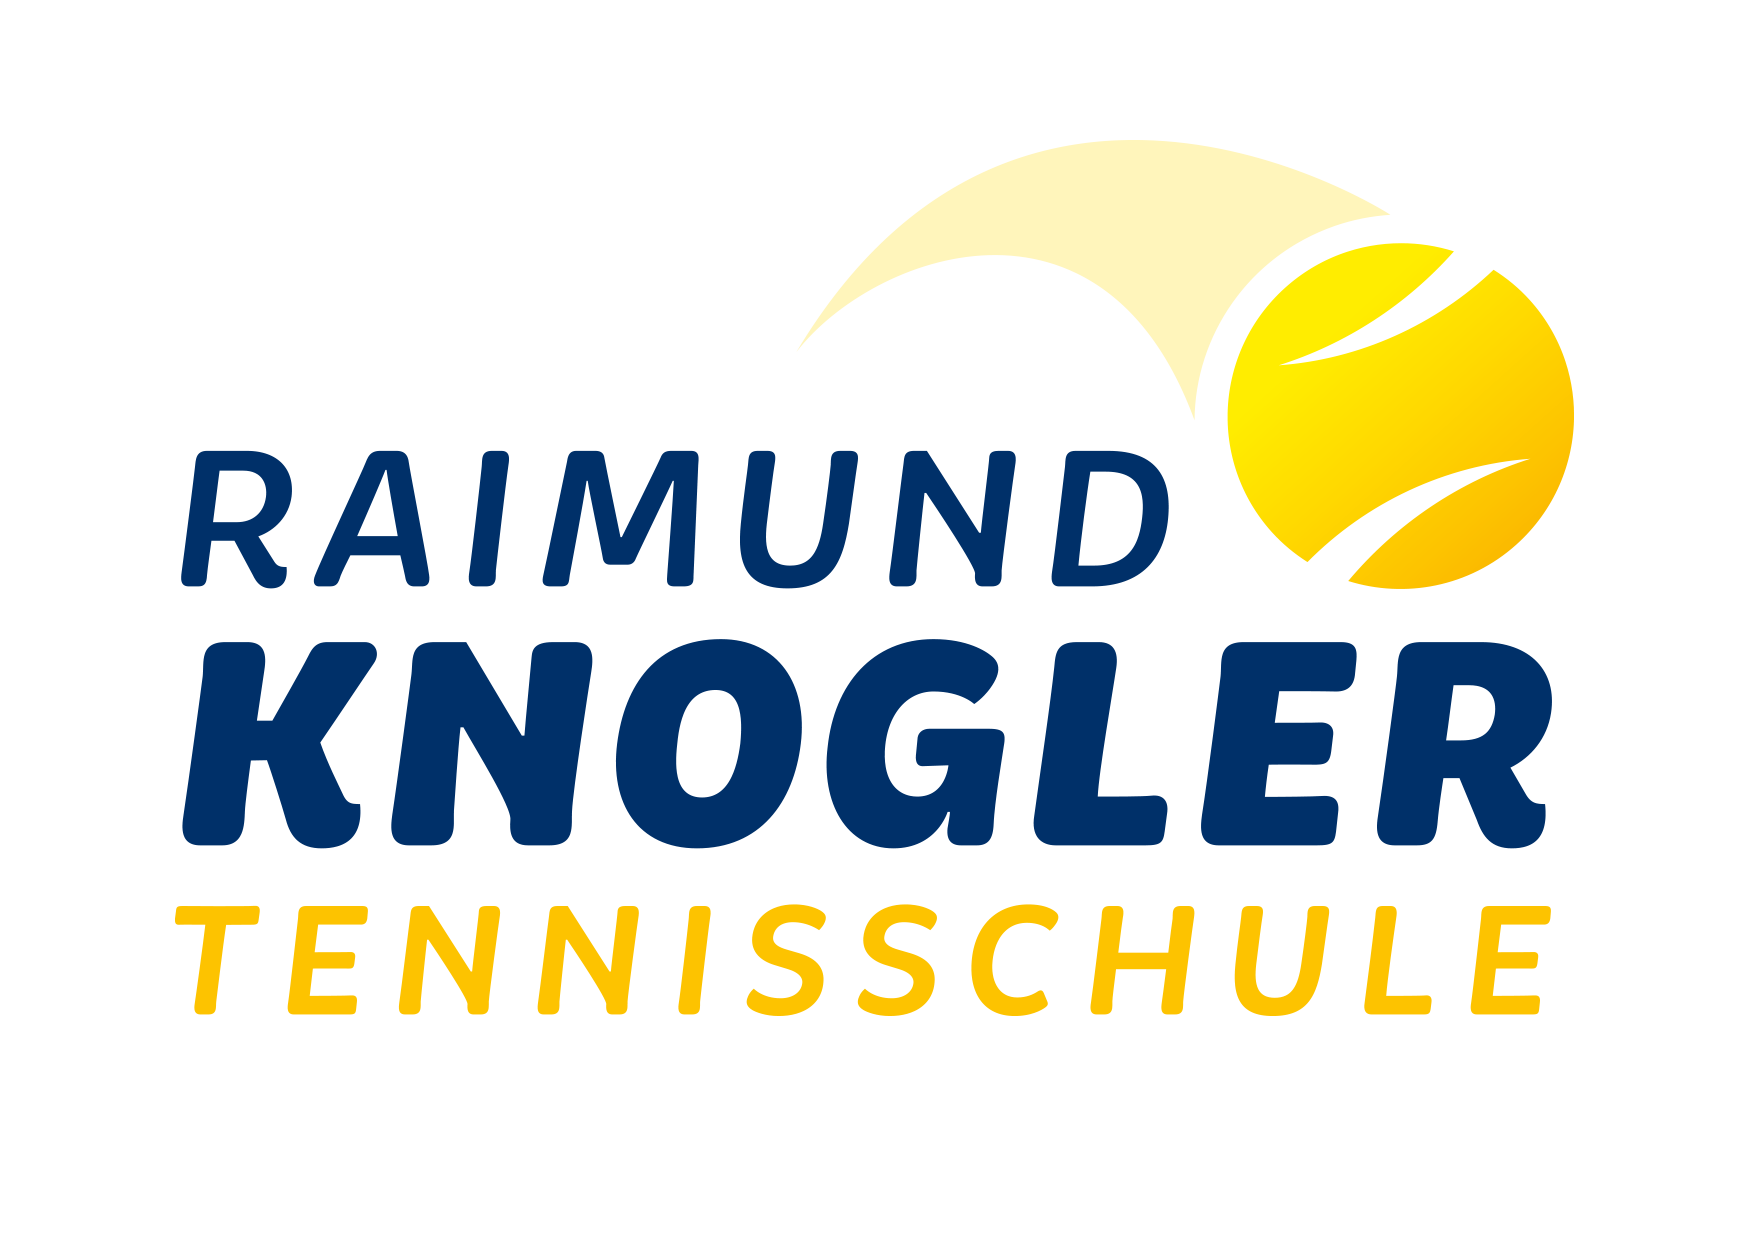 Logo Raimund Knogler Tennisschule | Werbeagentur Ritter